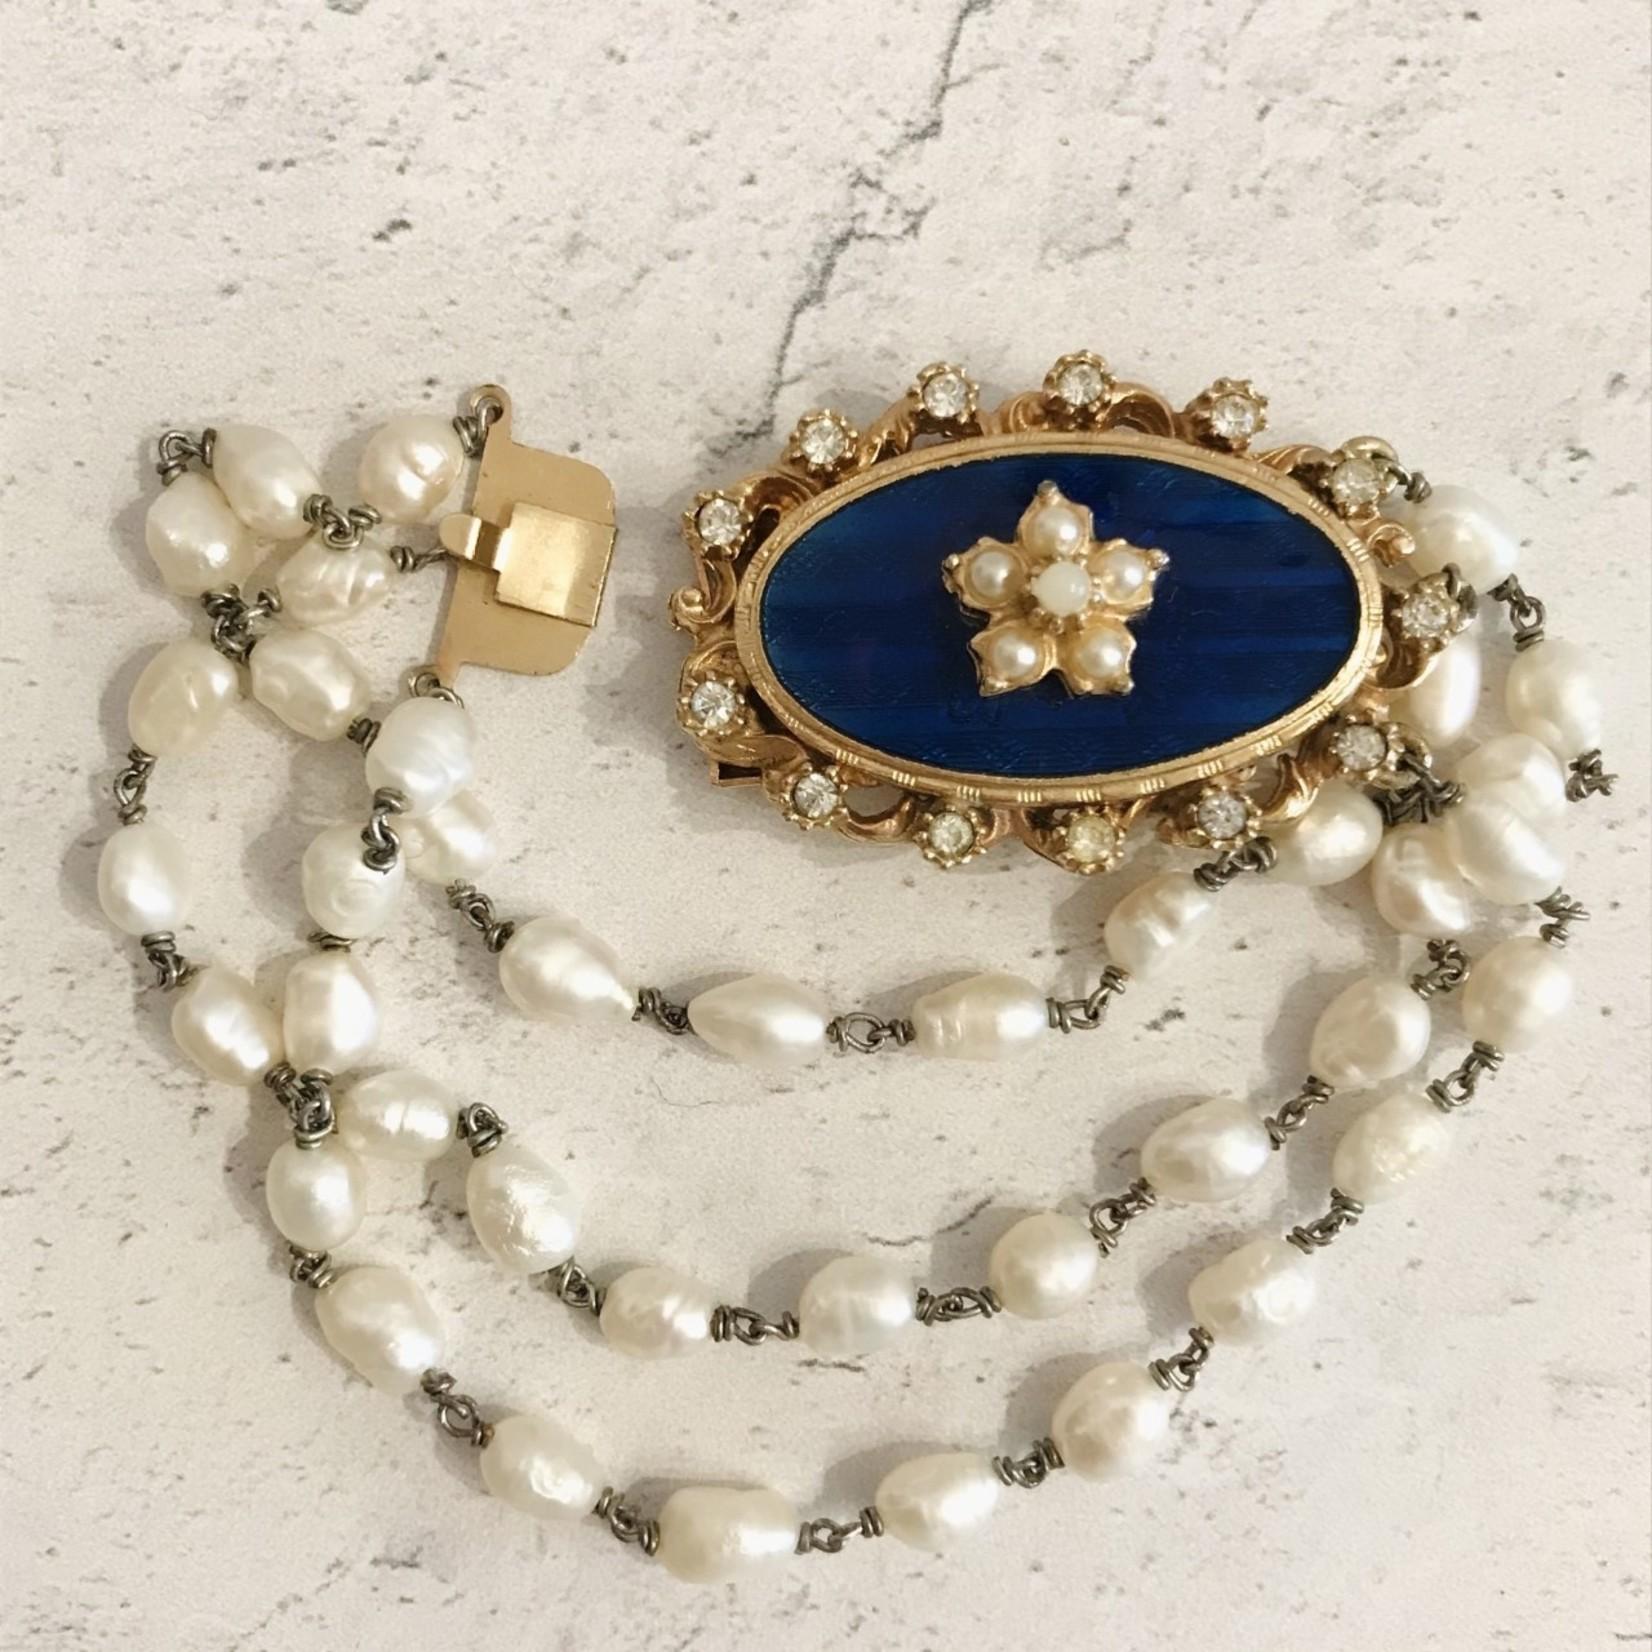 Vintage Royal Blue Guilloche Enamel+Pearls Bracelet